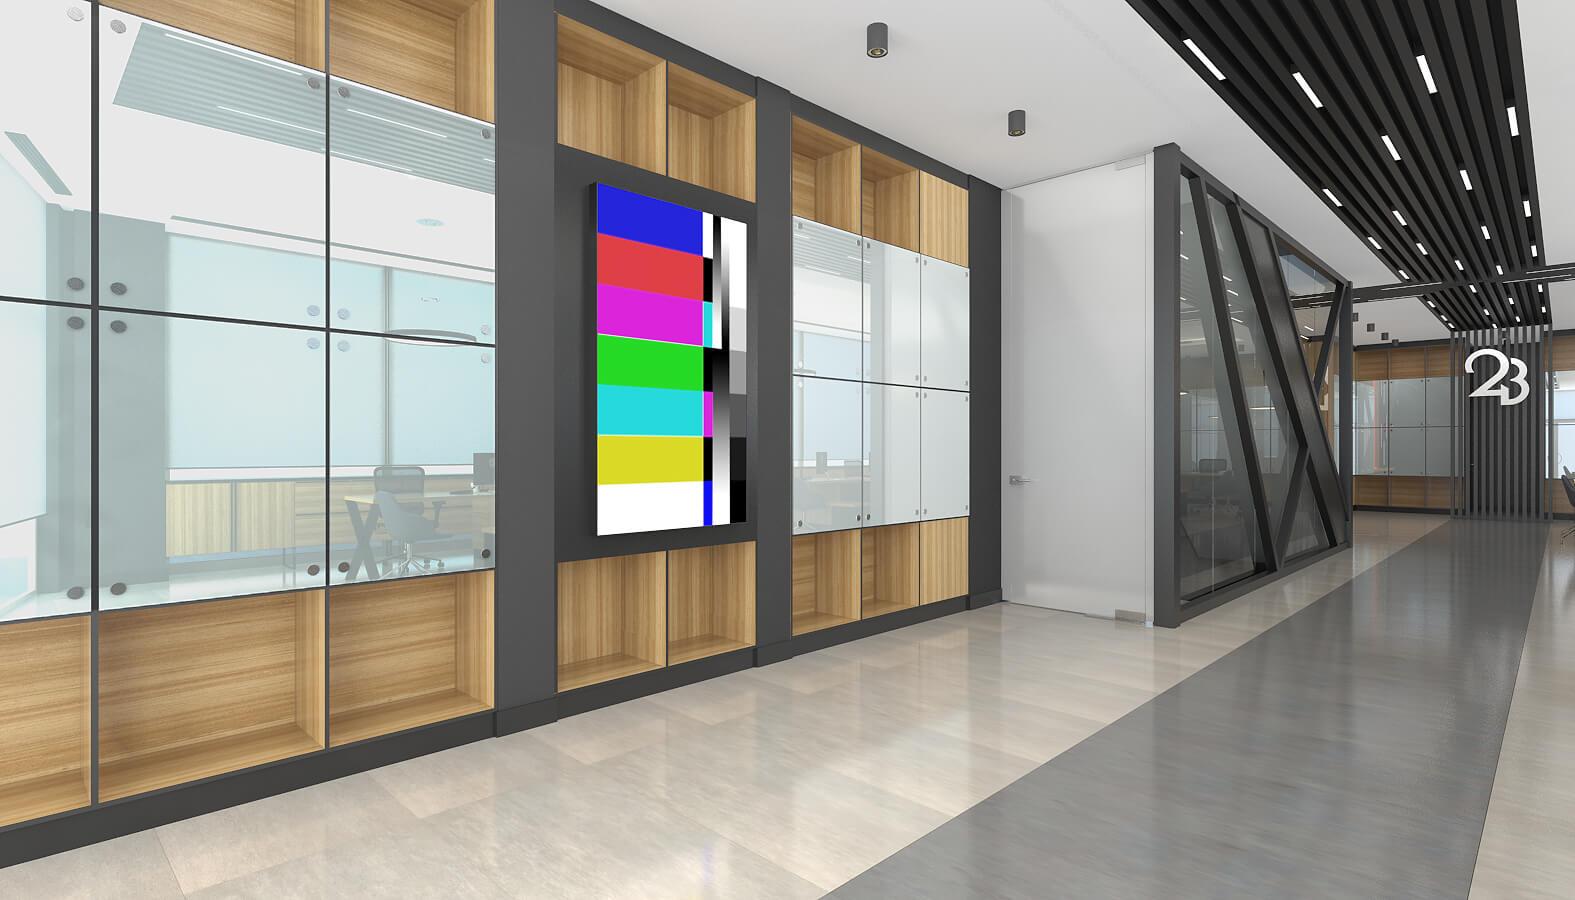 shop design 3525 2B Energy Retail